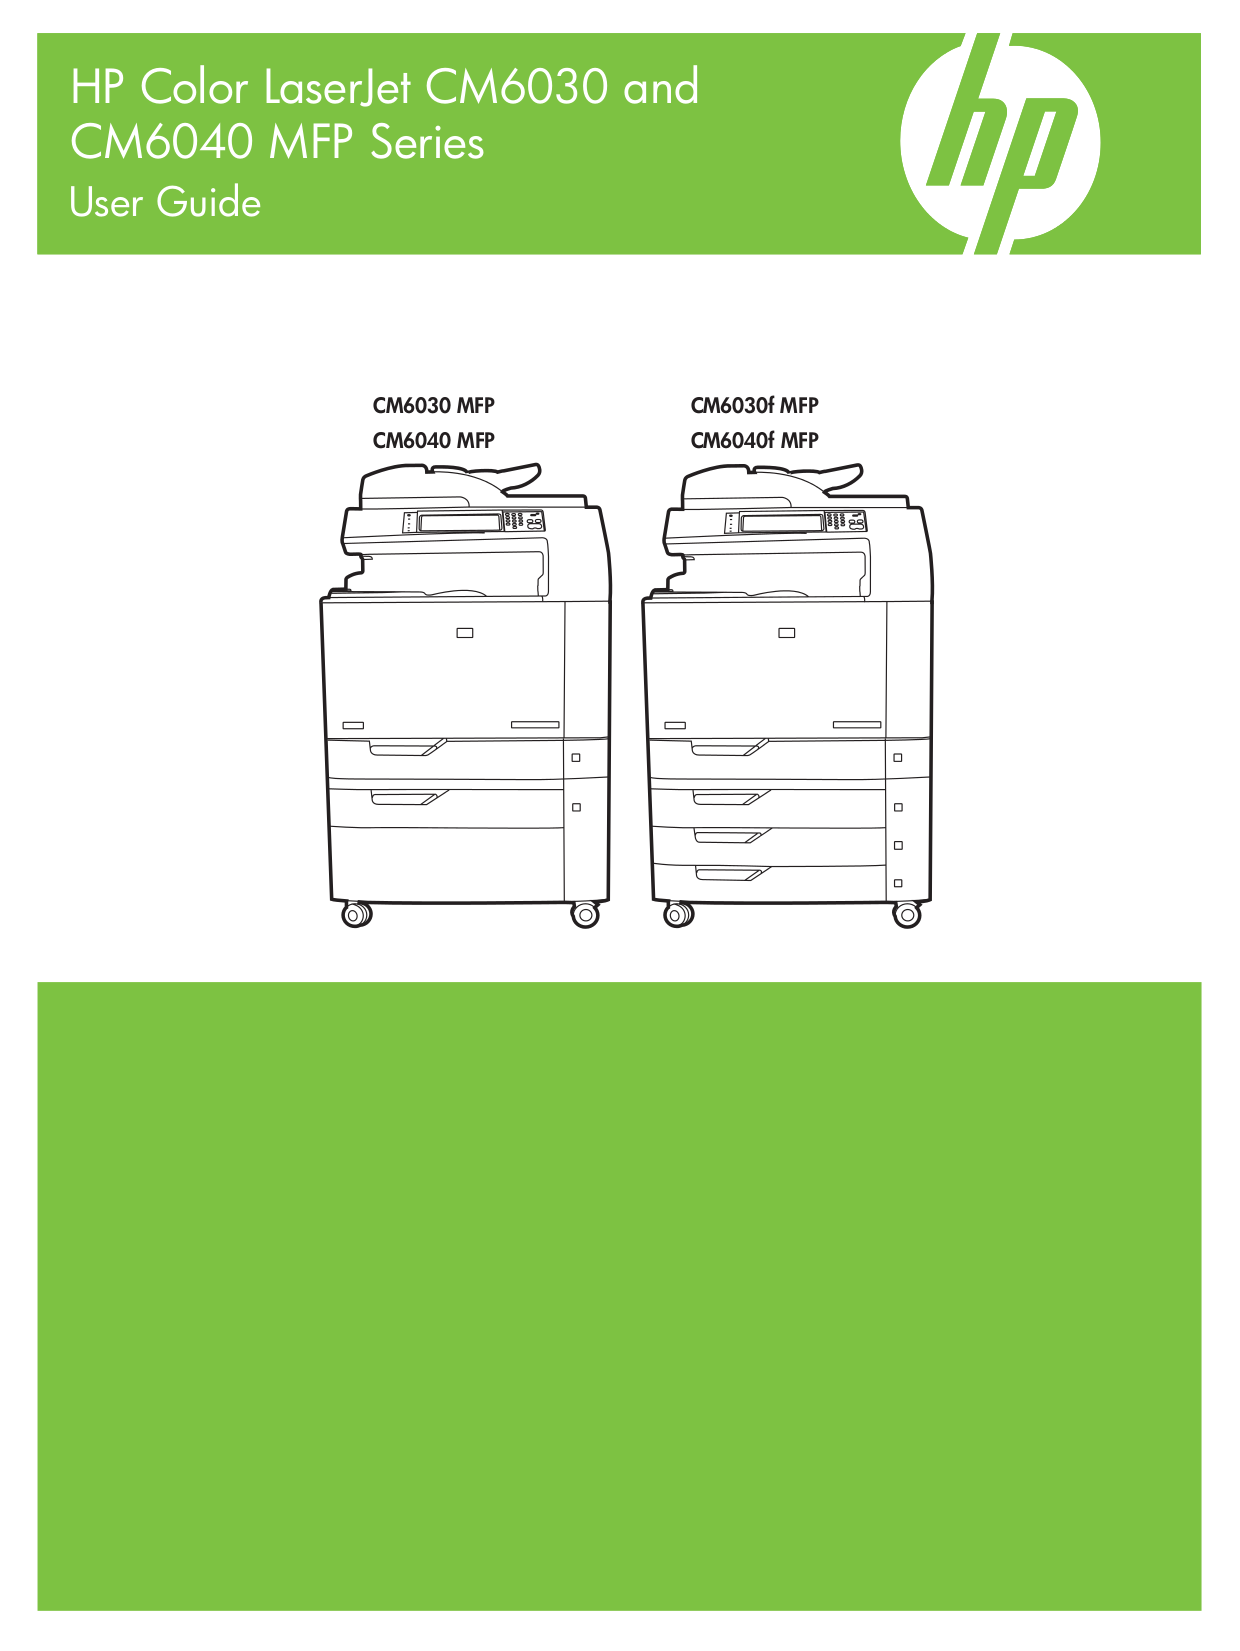 pdf for HP Multifunction Printer Laserjet,Color Laserjet CM6030f manual